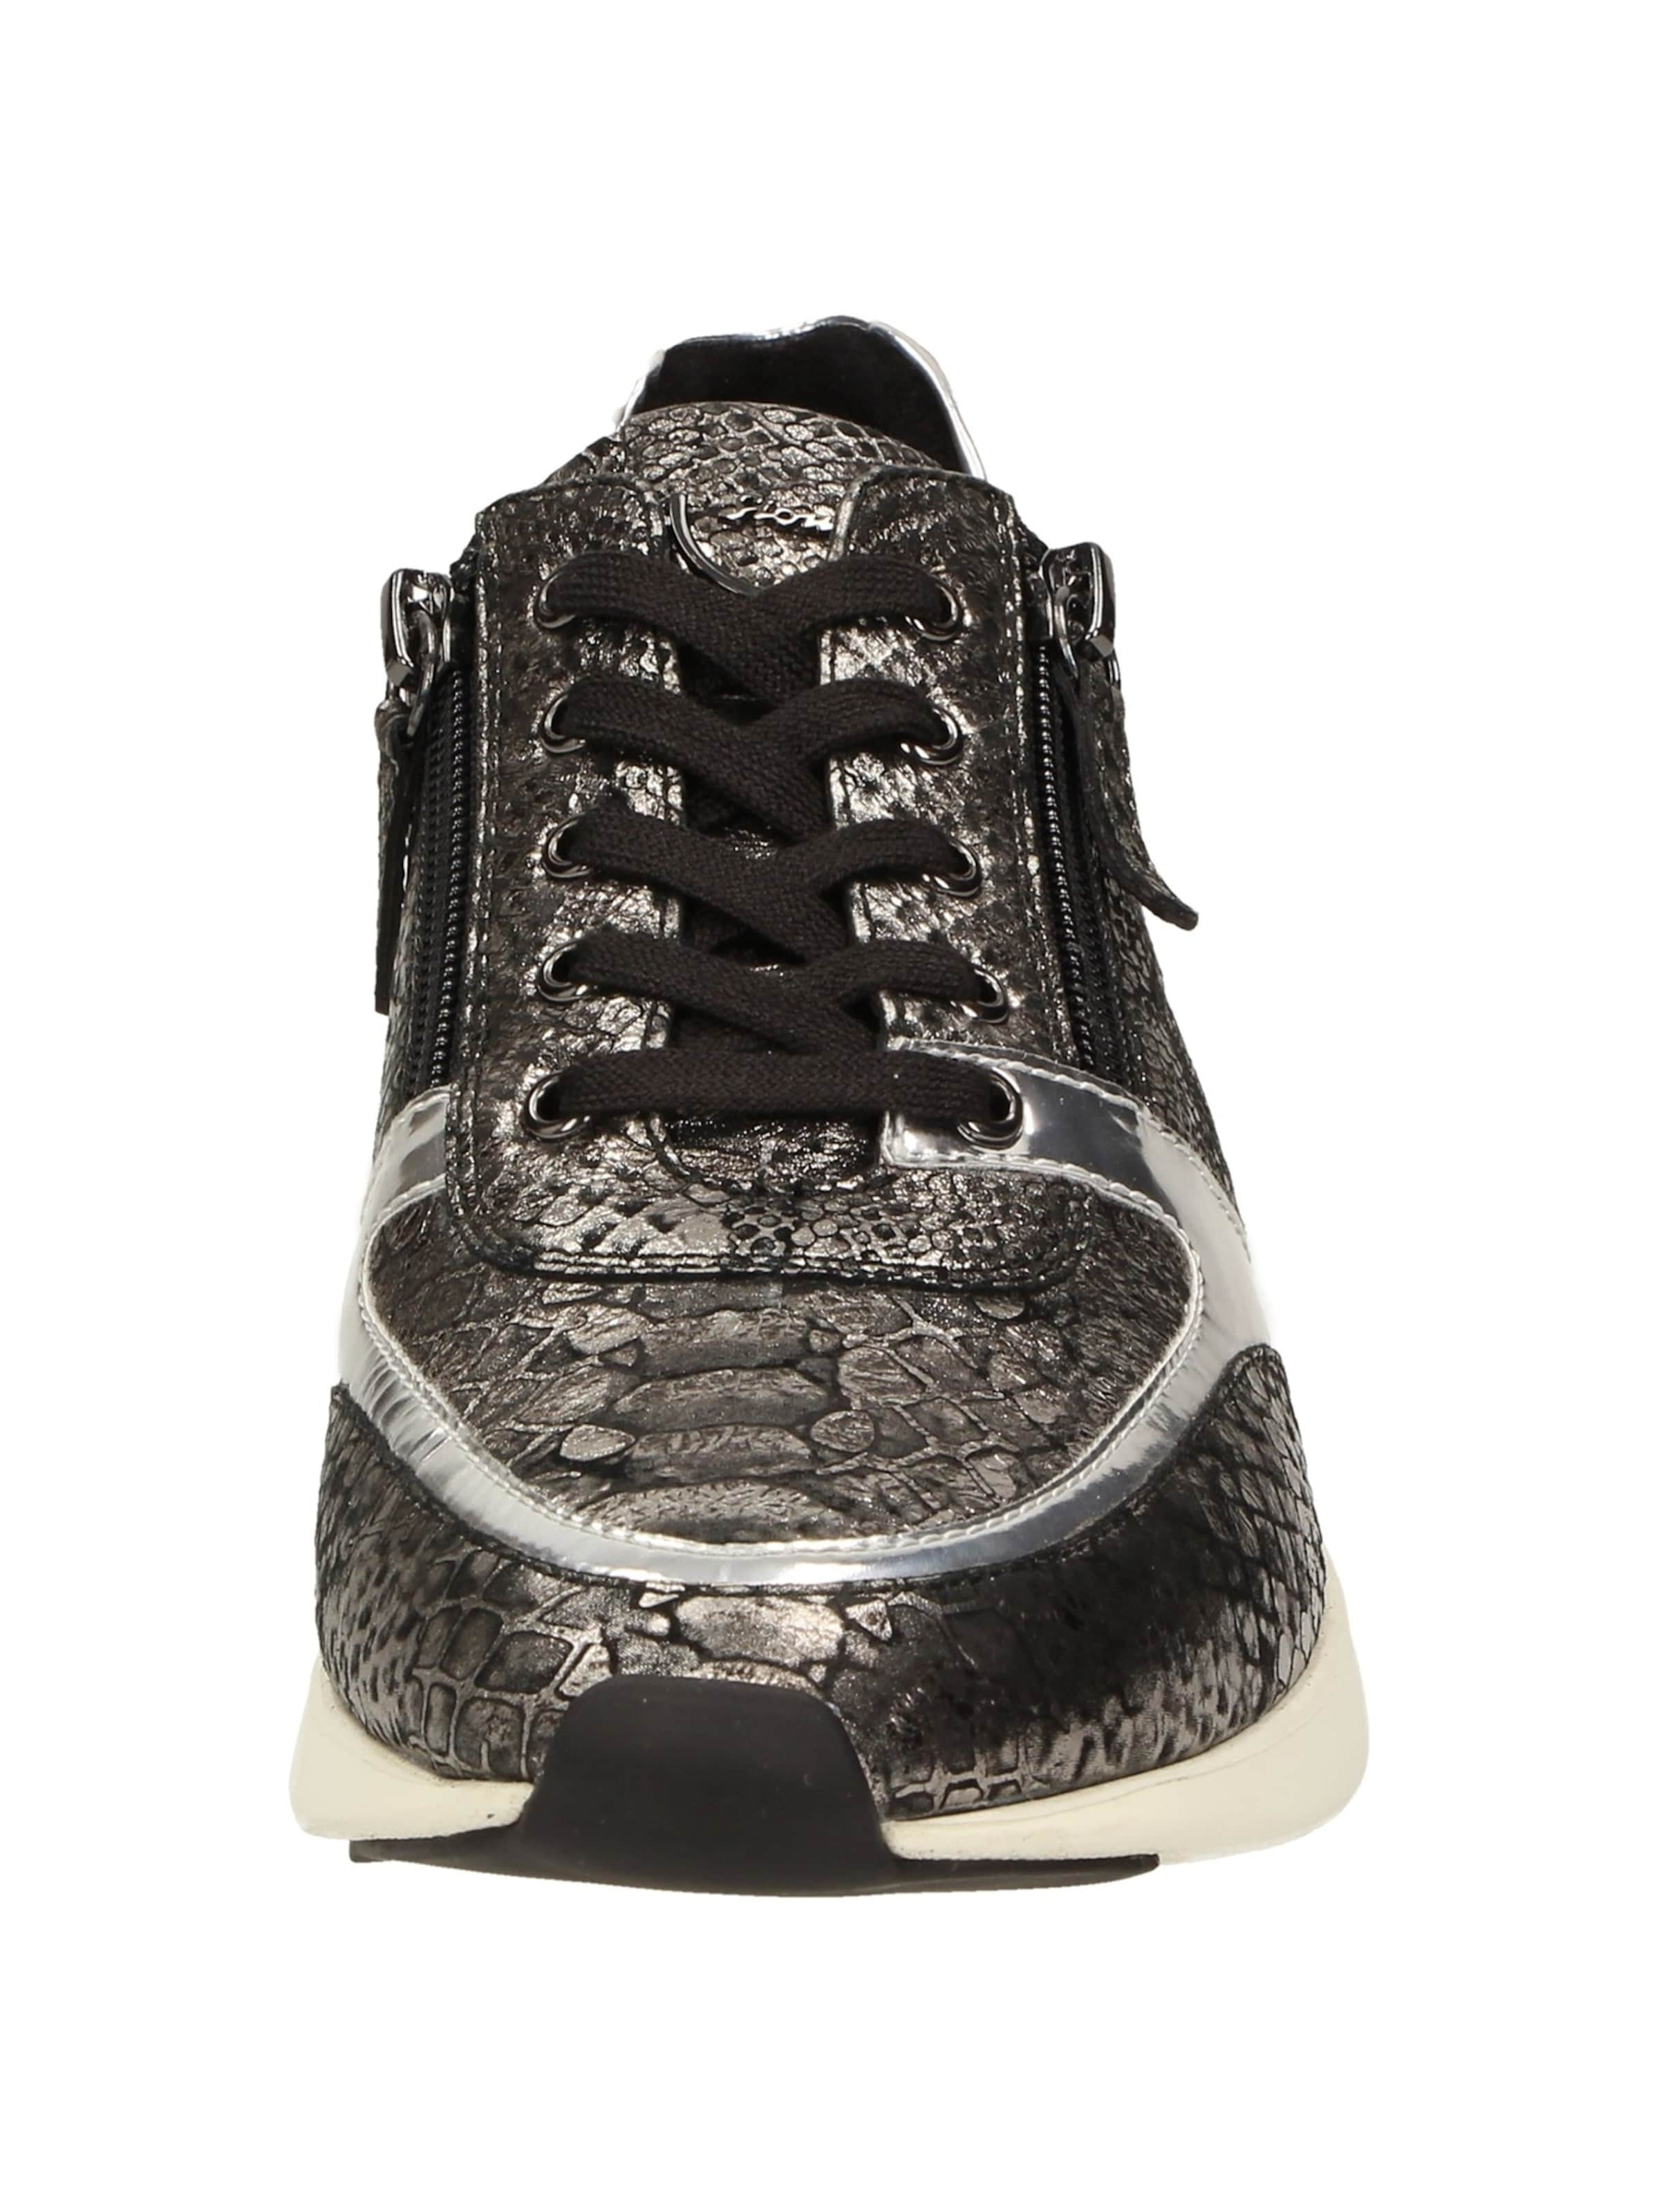 In Sneaker BronzeSchwarz 701' Sioux 'malosika m0NnOv8w